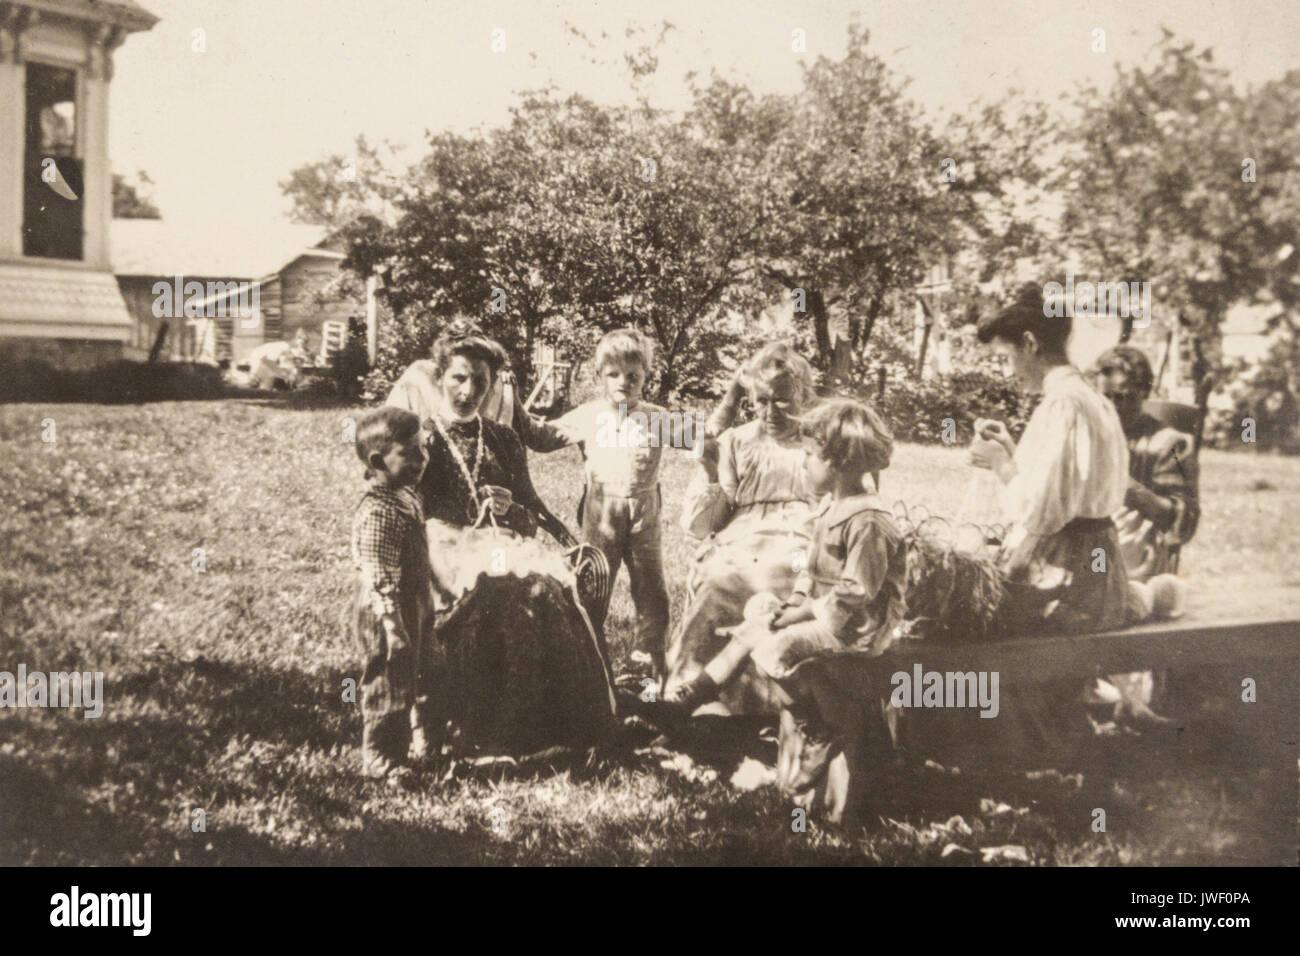 Women in Minnesota USA 1907-1908 having fun Stock Photo